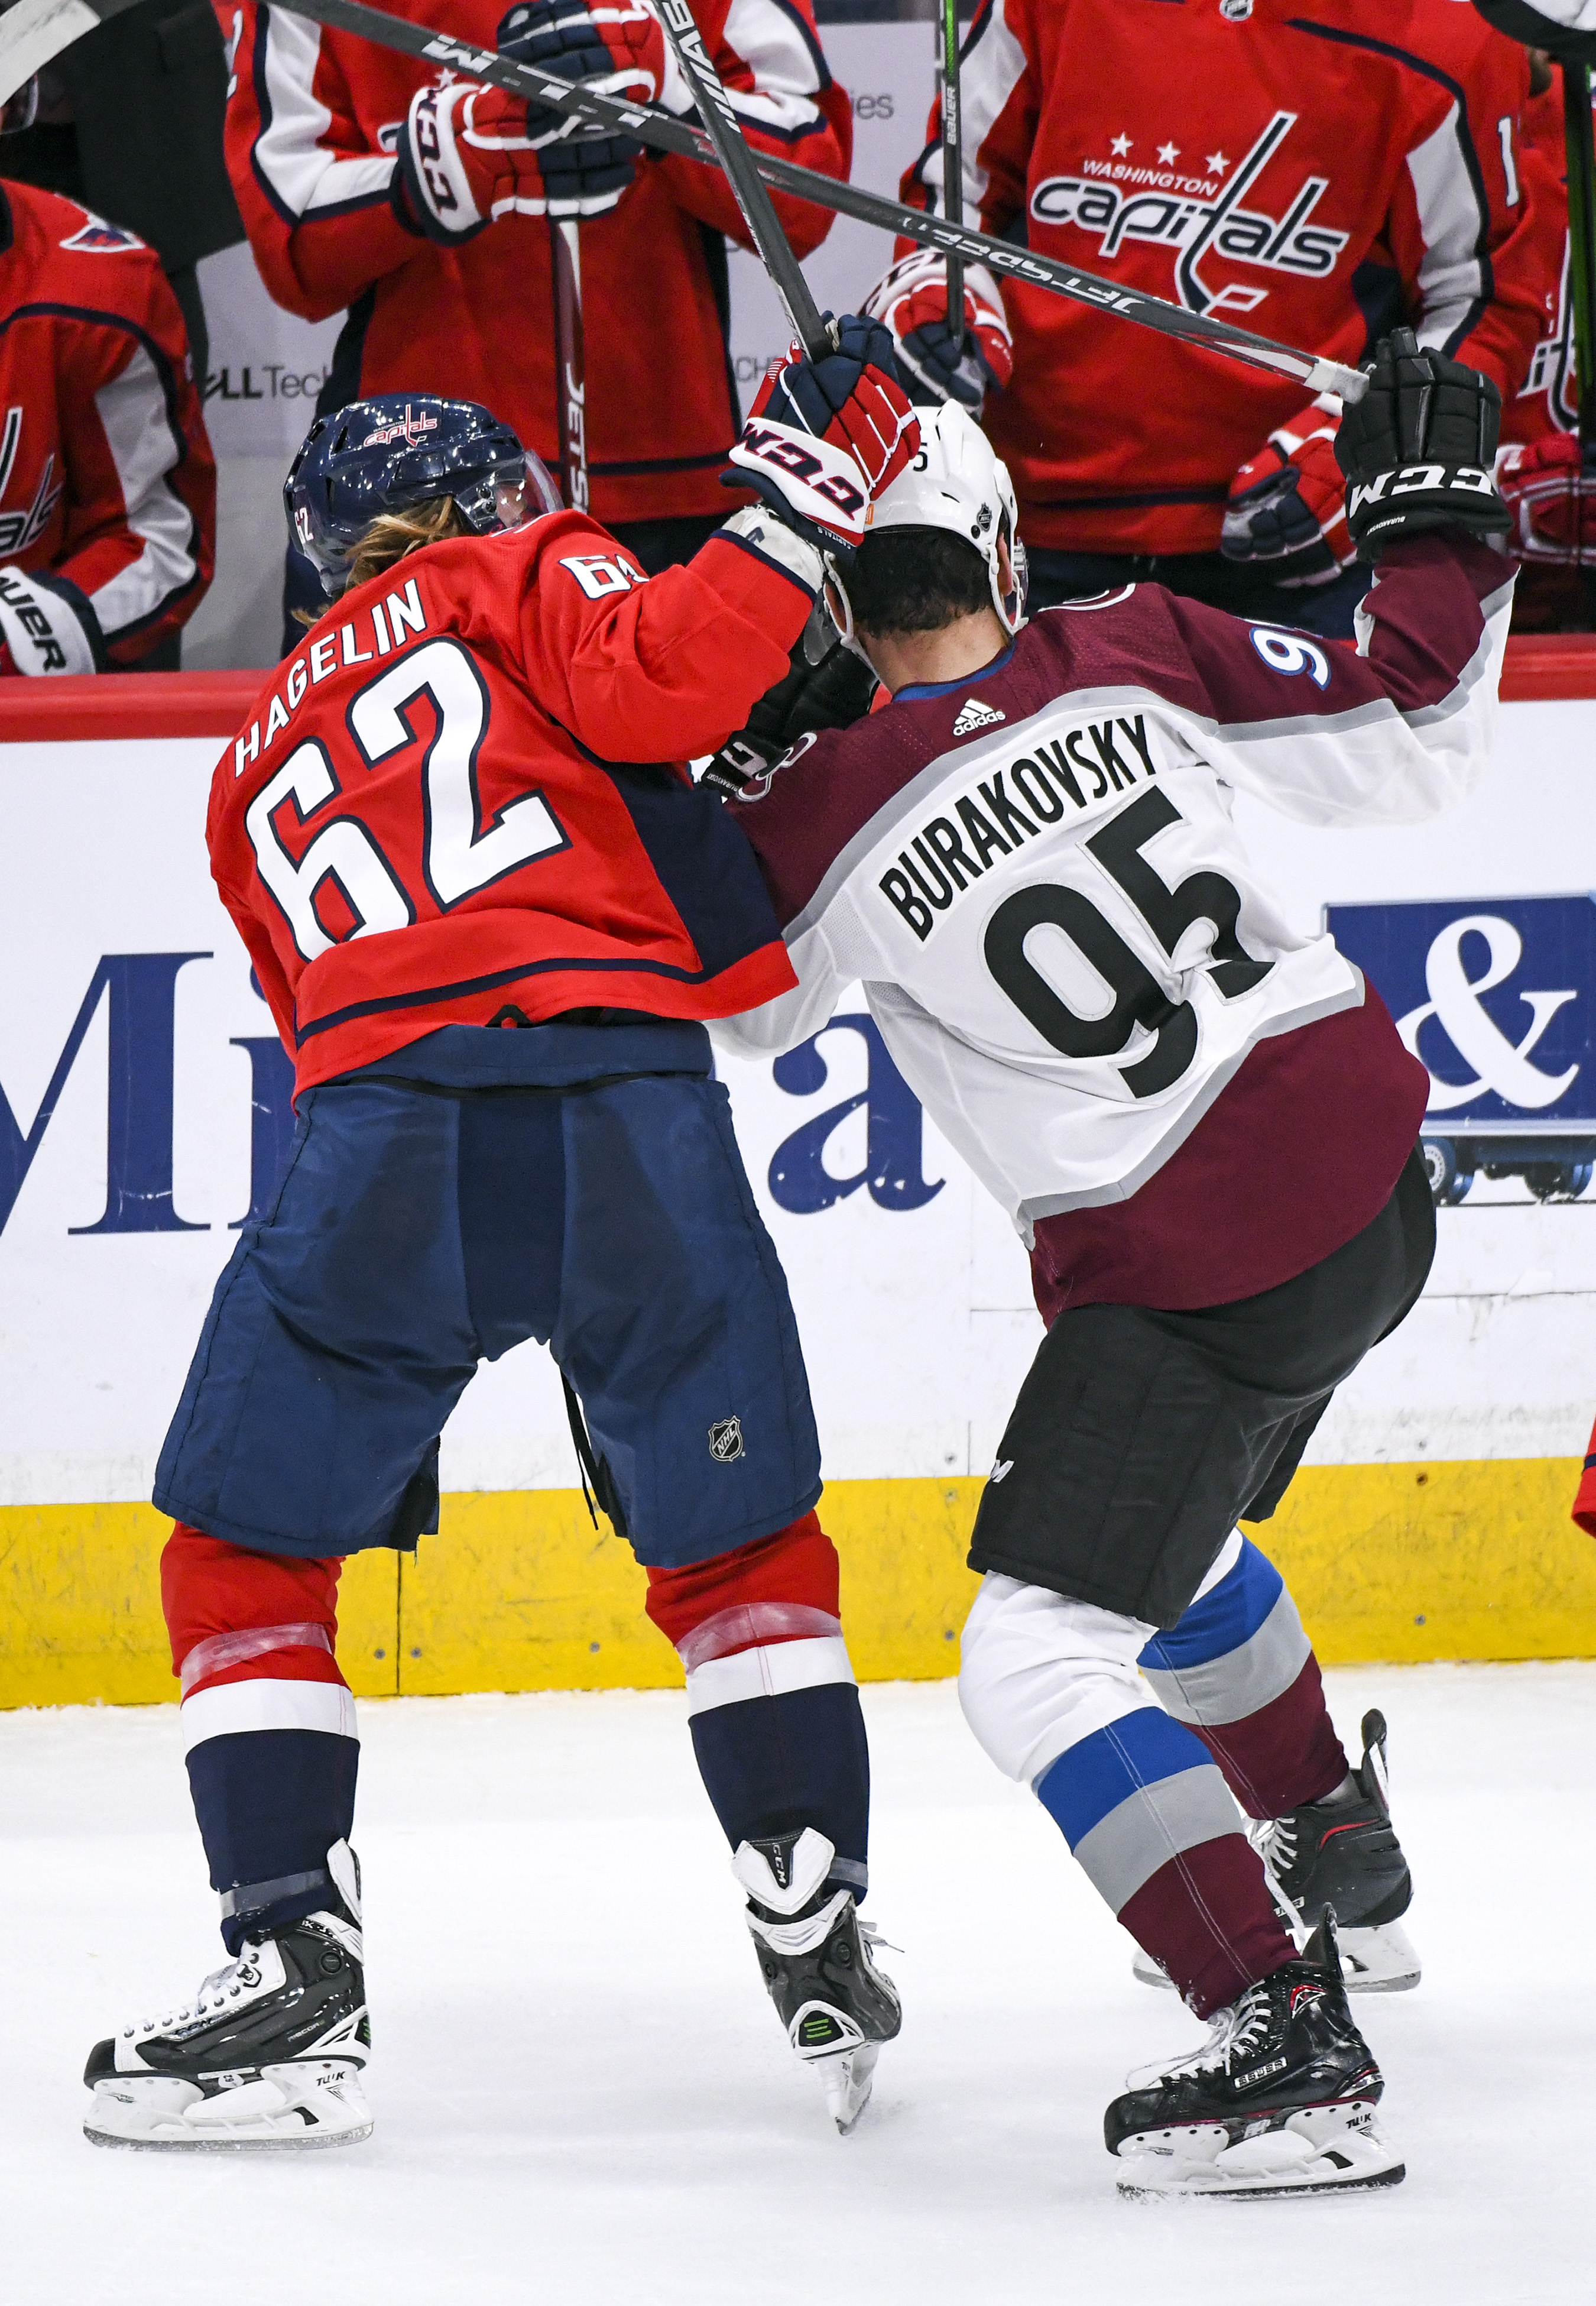 NHL: OCT 14 Avalanche at Capitals